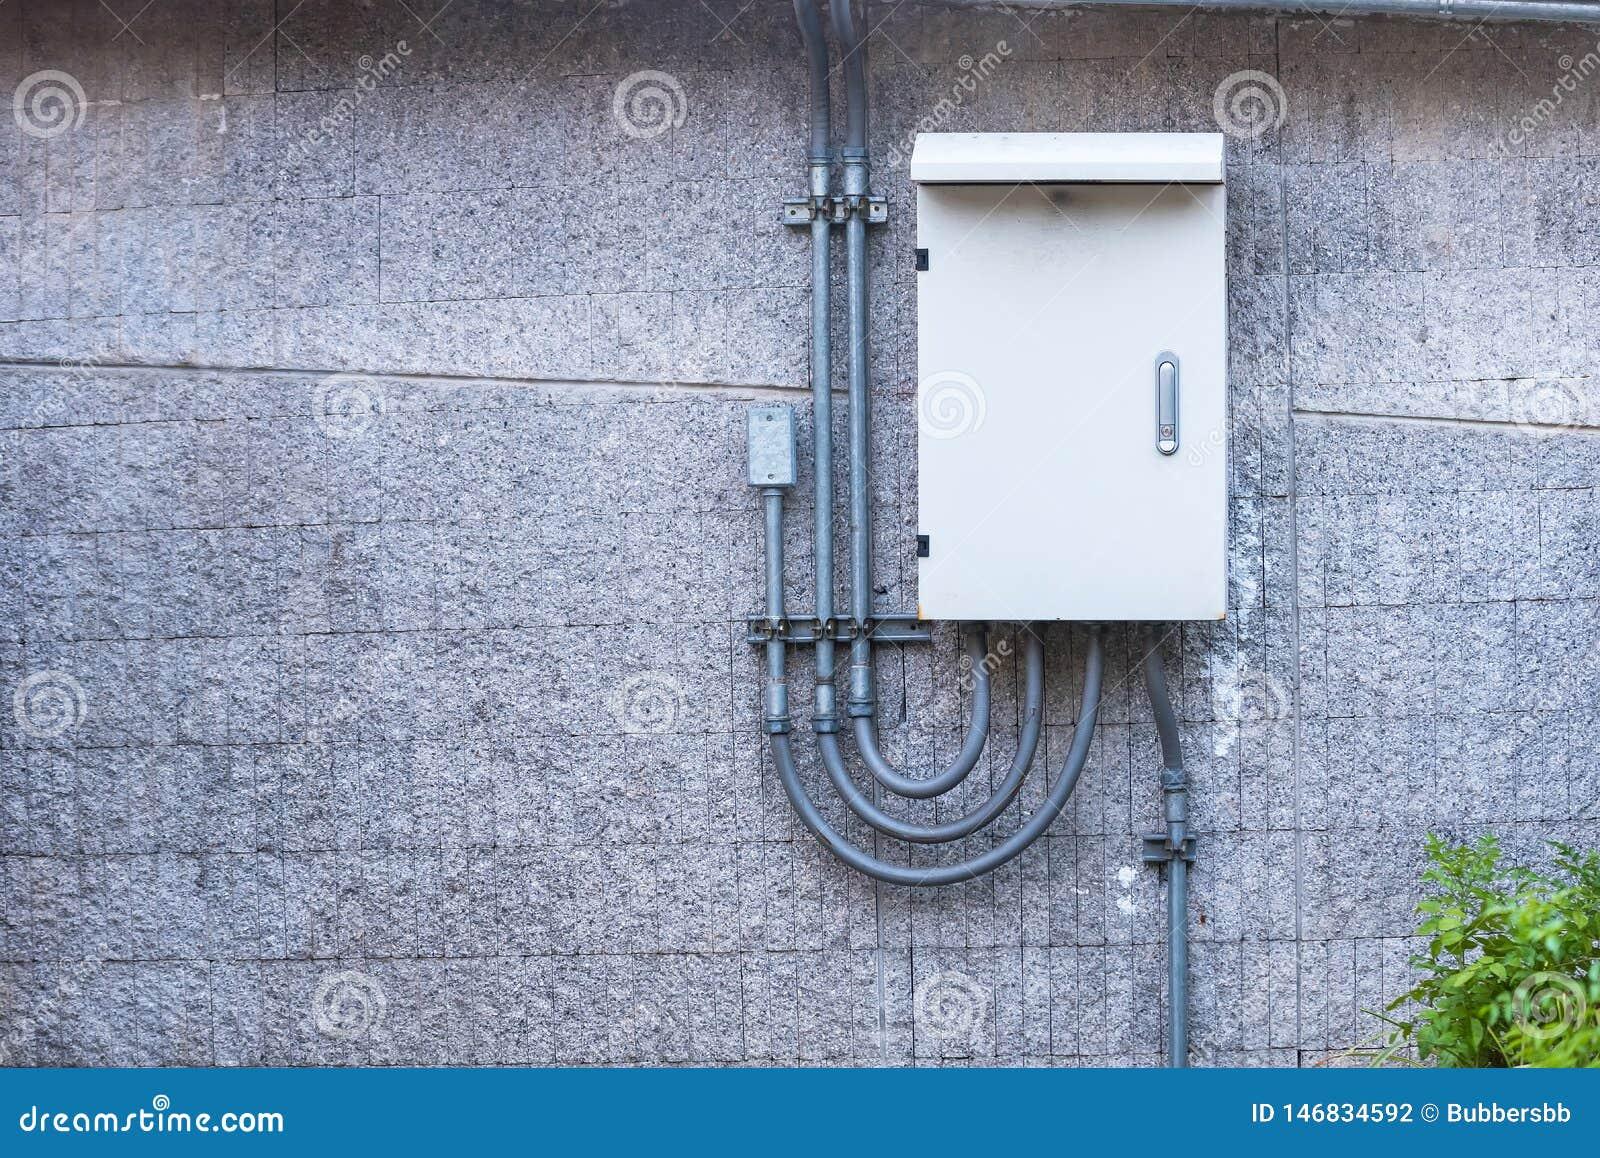 Outdoor electric control box.Thailand